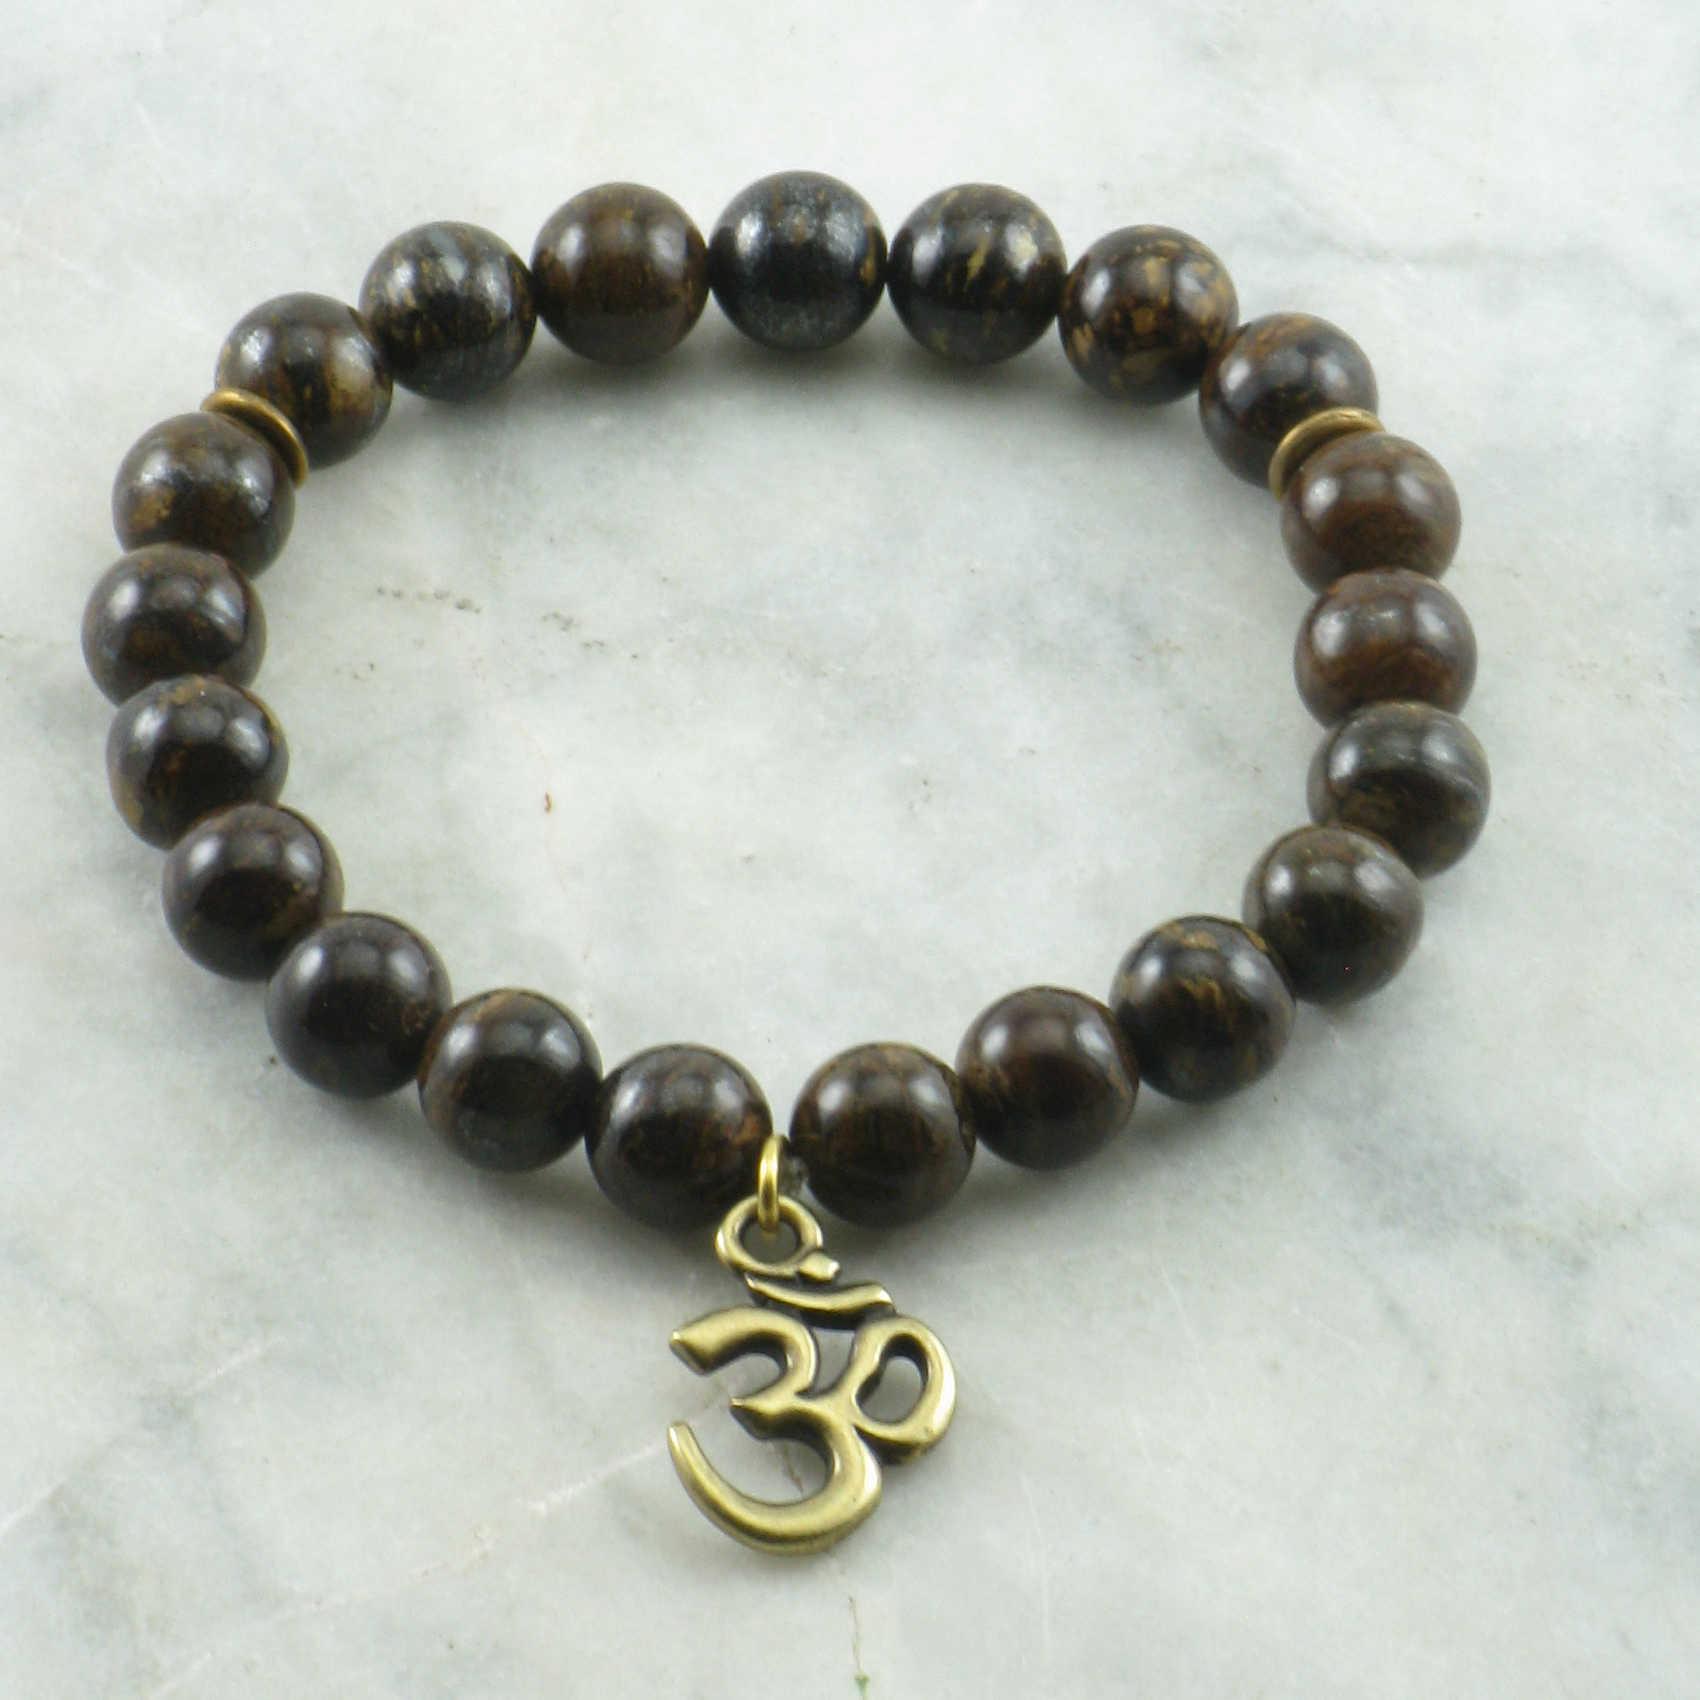 Yoga Beads: 21 Bronzite Mala Beads, Yoga